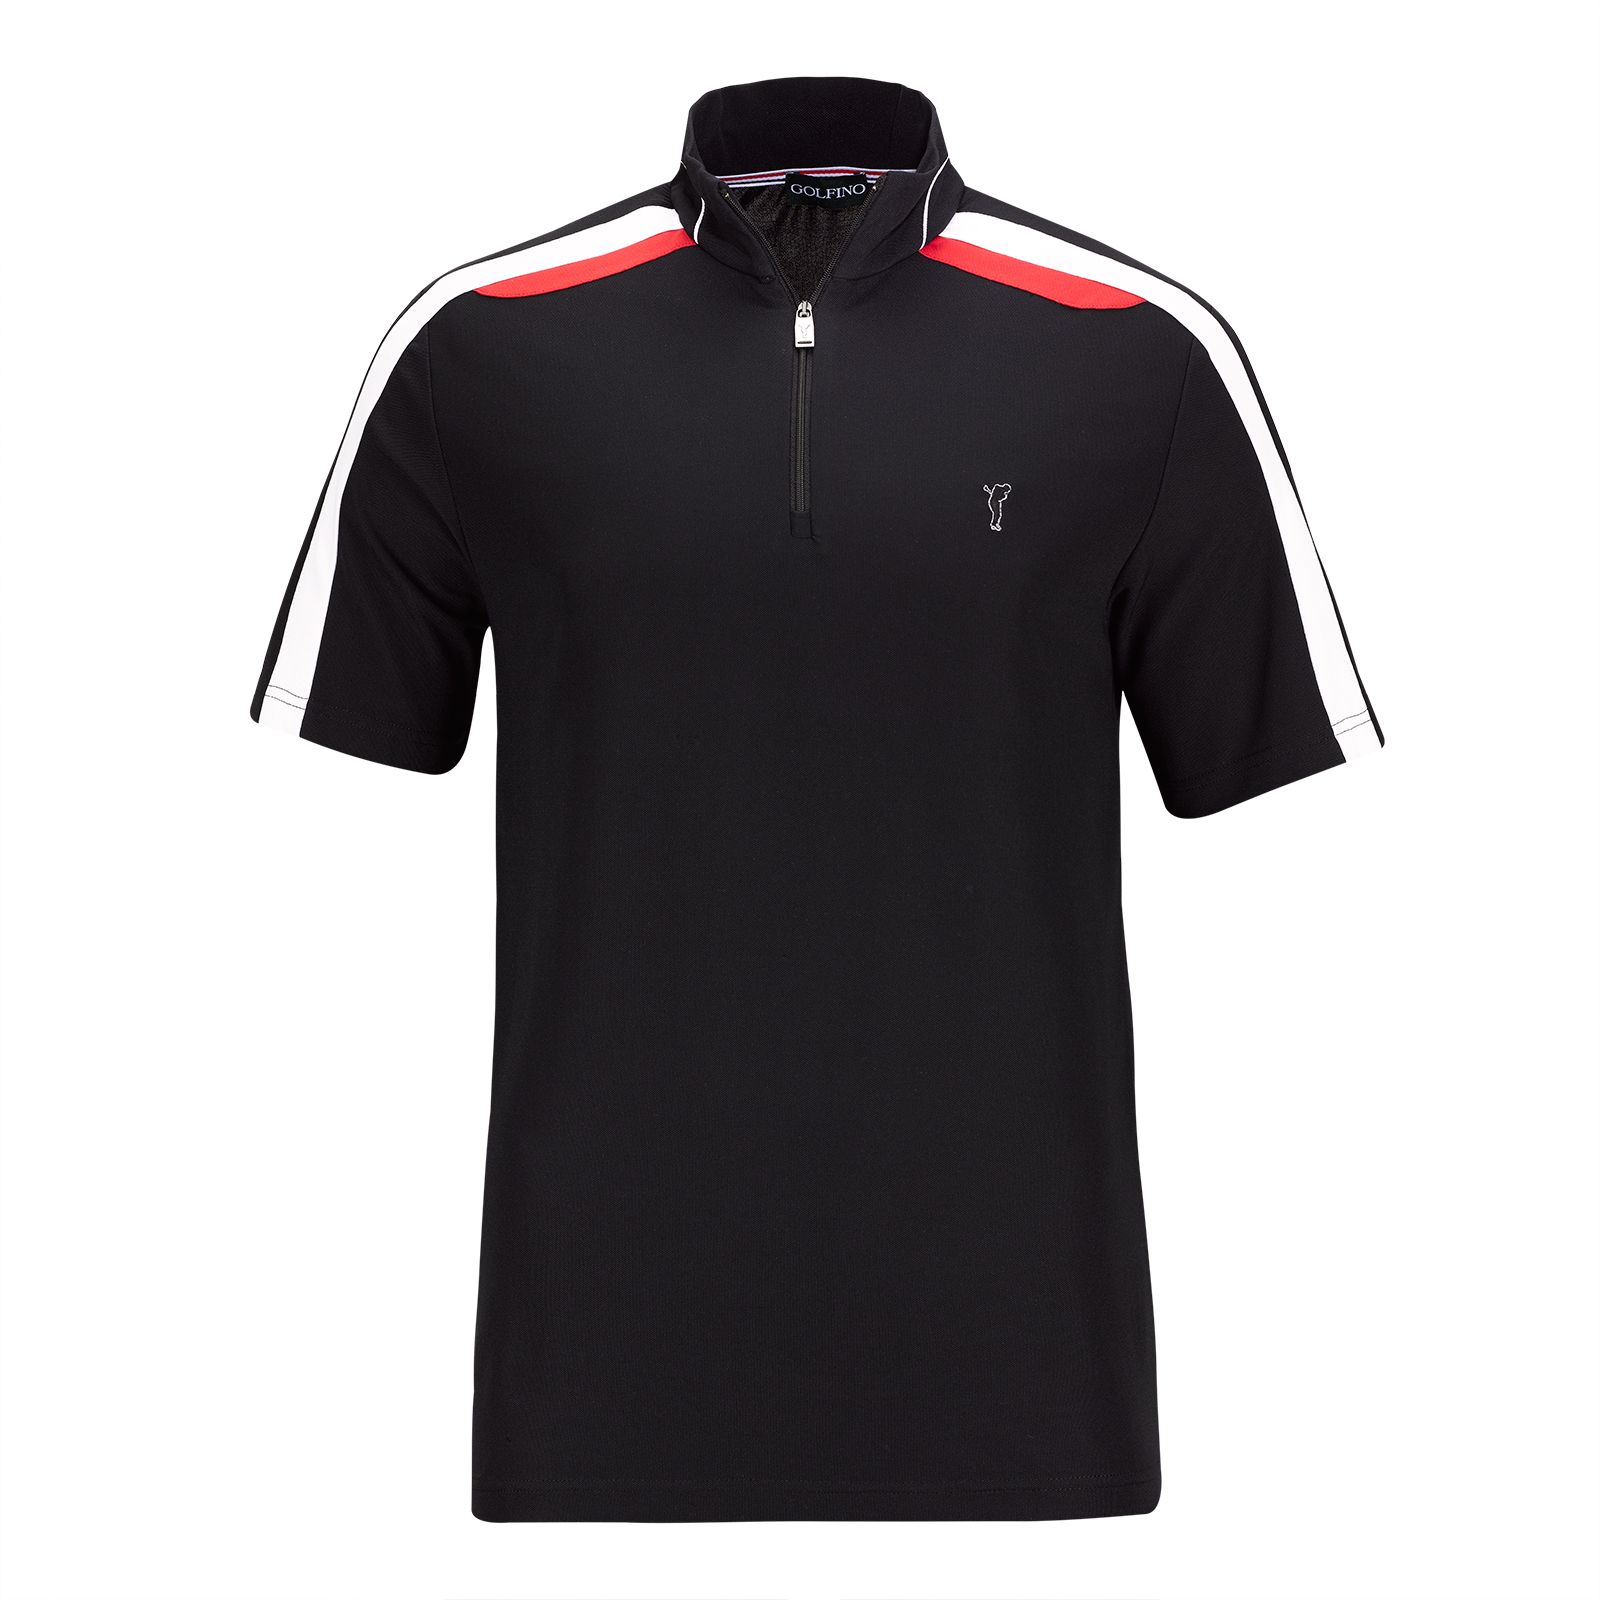 Jersey de golf con cremallera delantera Performance de manga corta de hombre Extra Dry en un look profesional